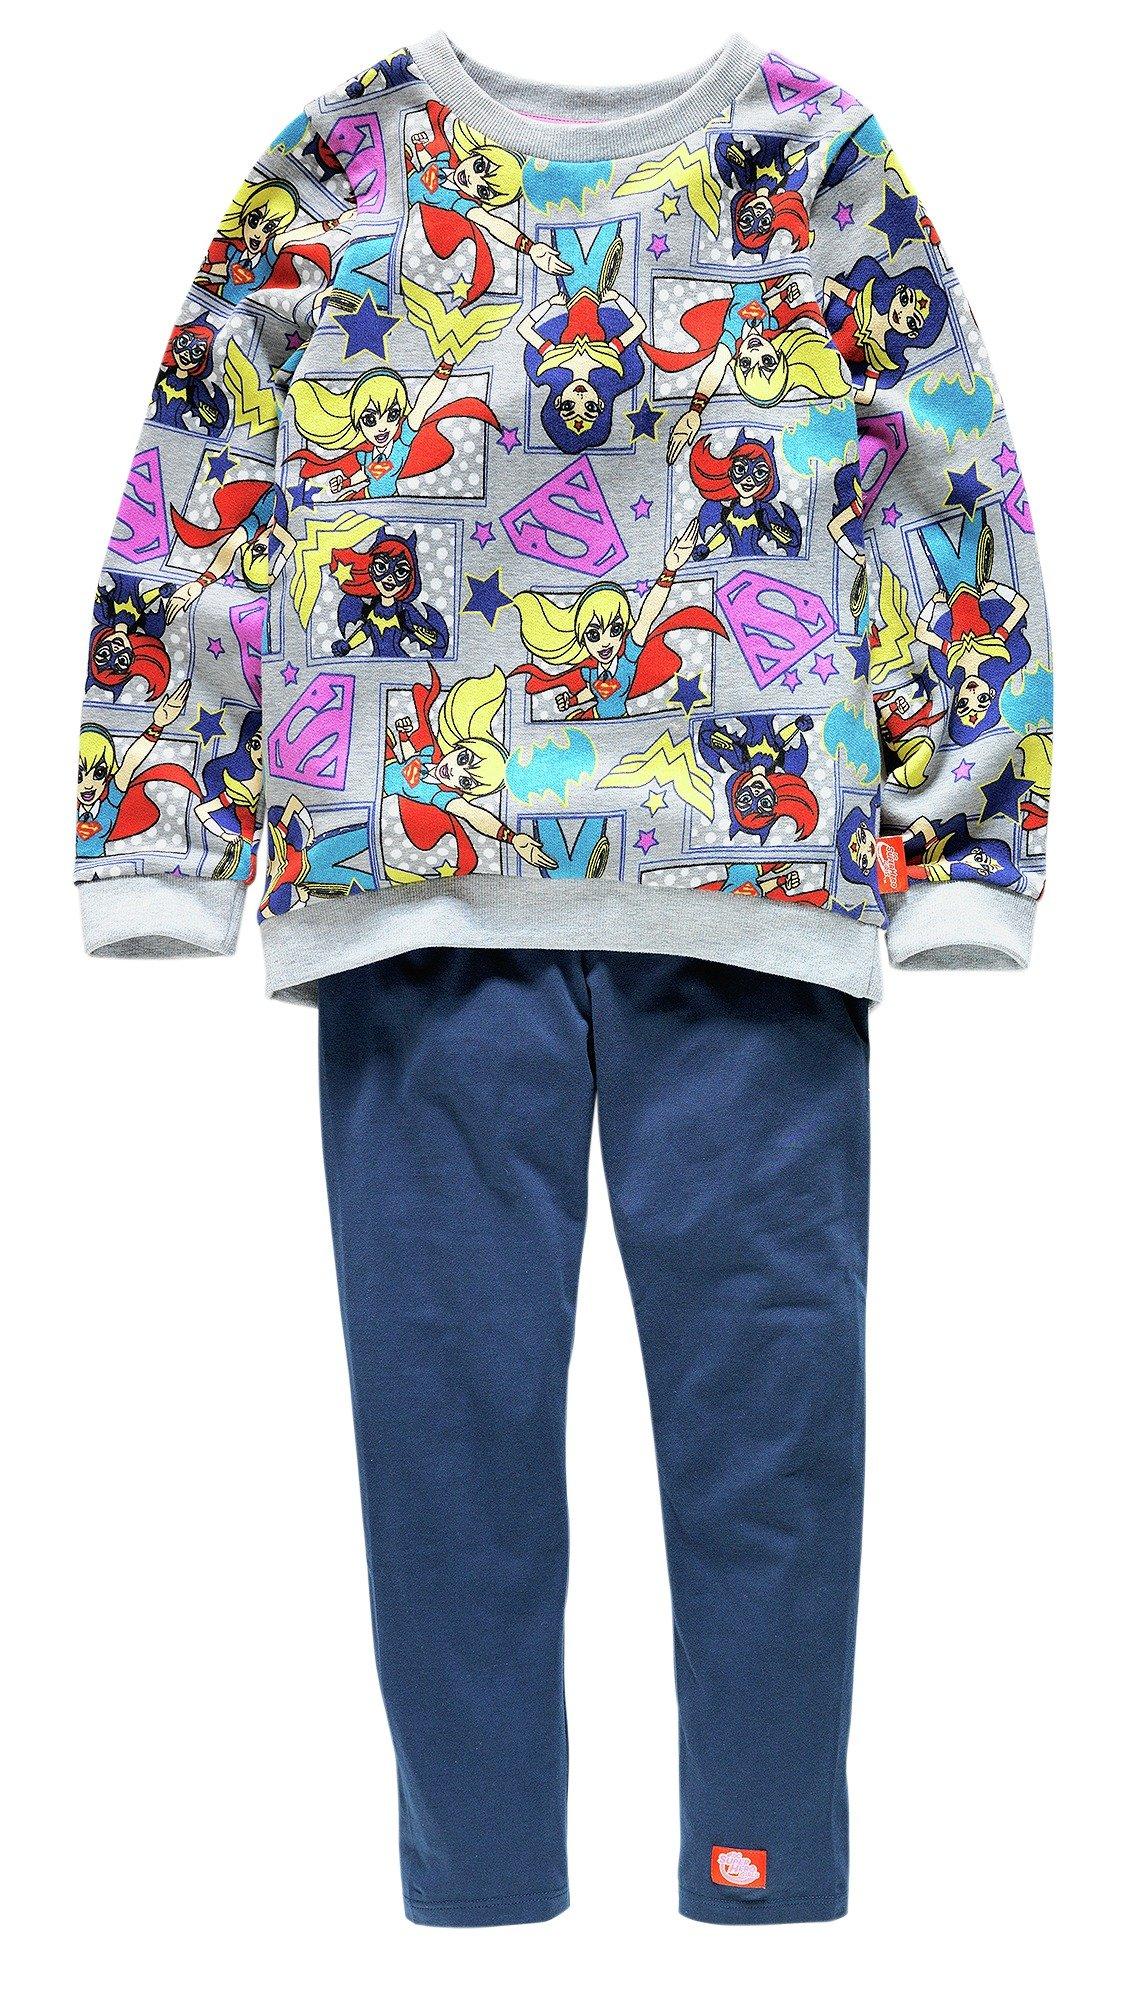 Image of DC - Supergirl Sweatshirt & Leggings Set - 11-12 Years